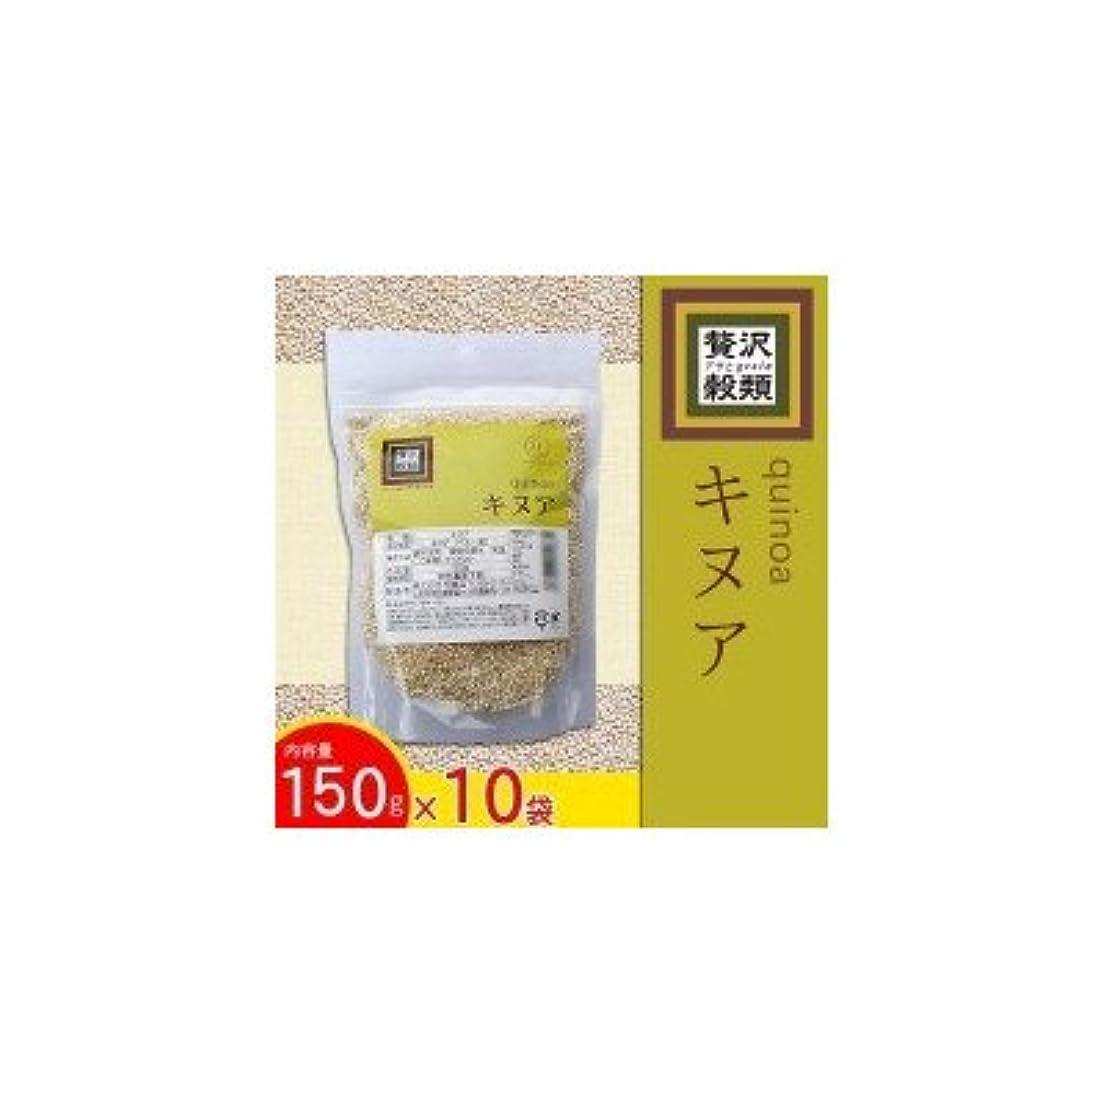 近々端末天才贅沢穀類 キヌア 150g×10袋